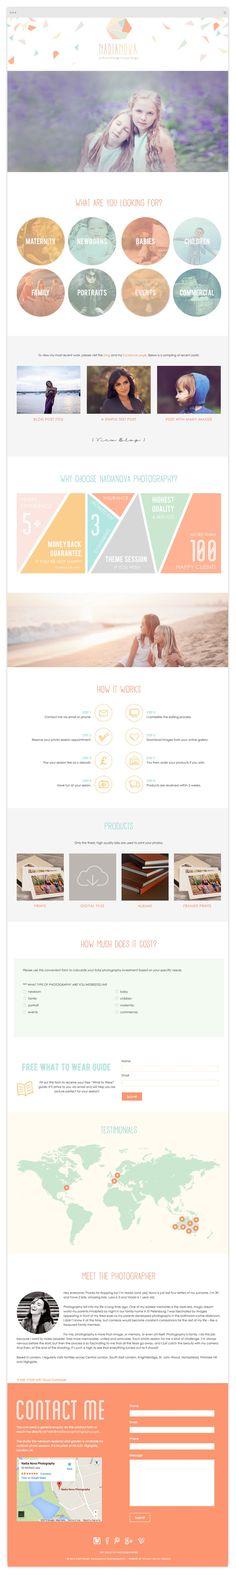 Custom Responsive Website Design by Tiffany Kelley Design :: Web Design #design #designer #graphicdesign #graphicdesigner #webdesign #webdesigner #designproject #branding #branddesign #brandidentity #photographerbranding #brandboard #wordpress #genesis #brandstylist #brandstyling